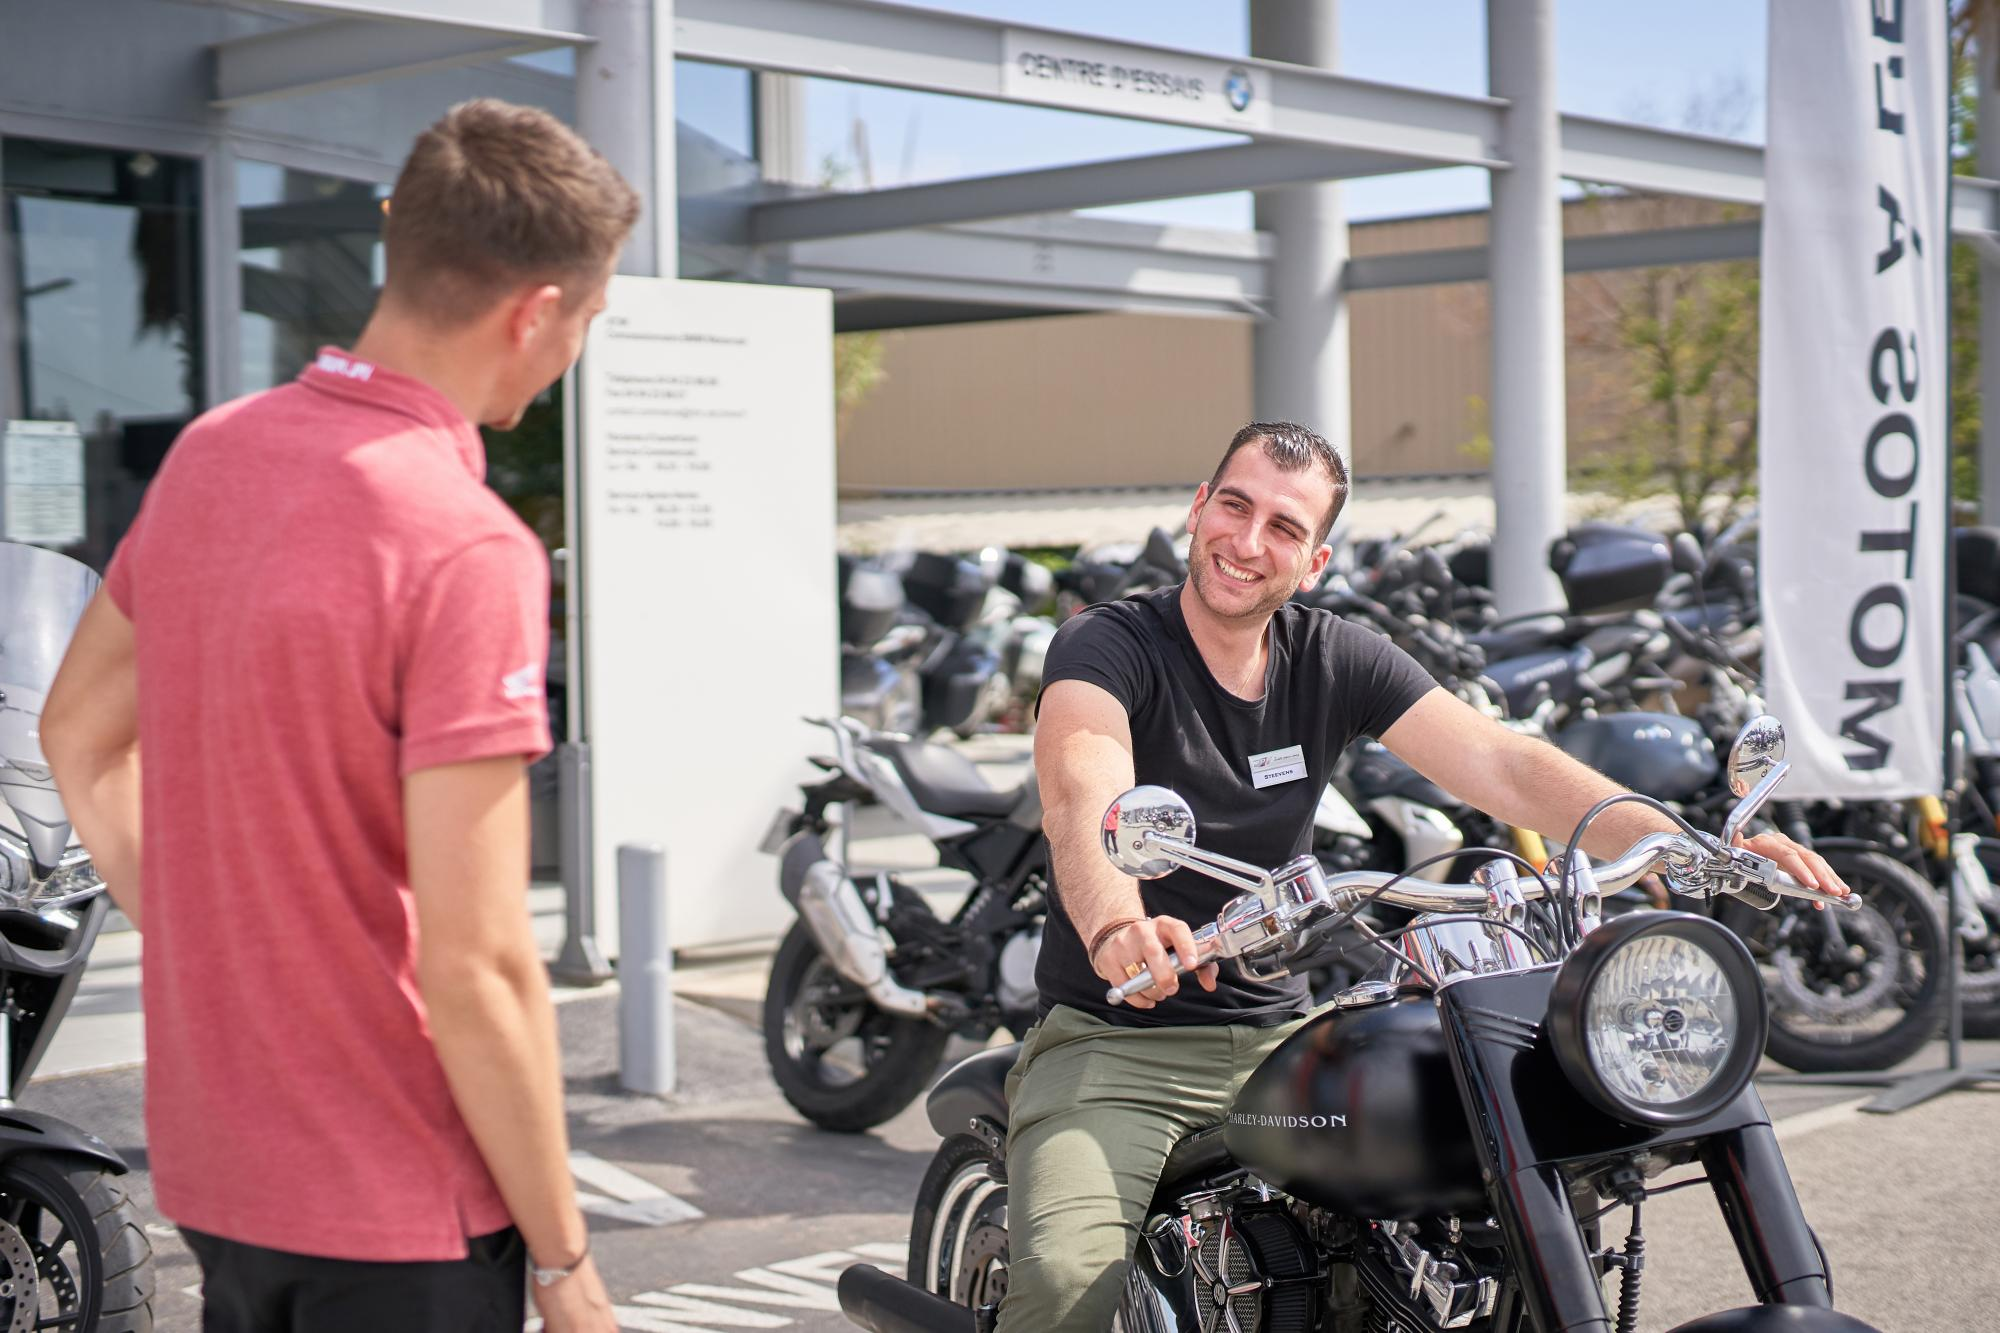 HONDA motos accueil clients Toulon